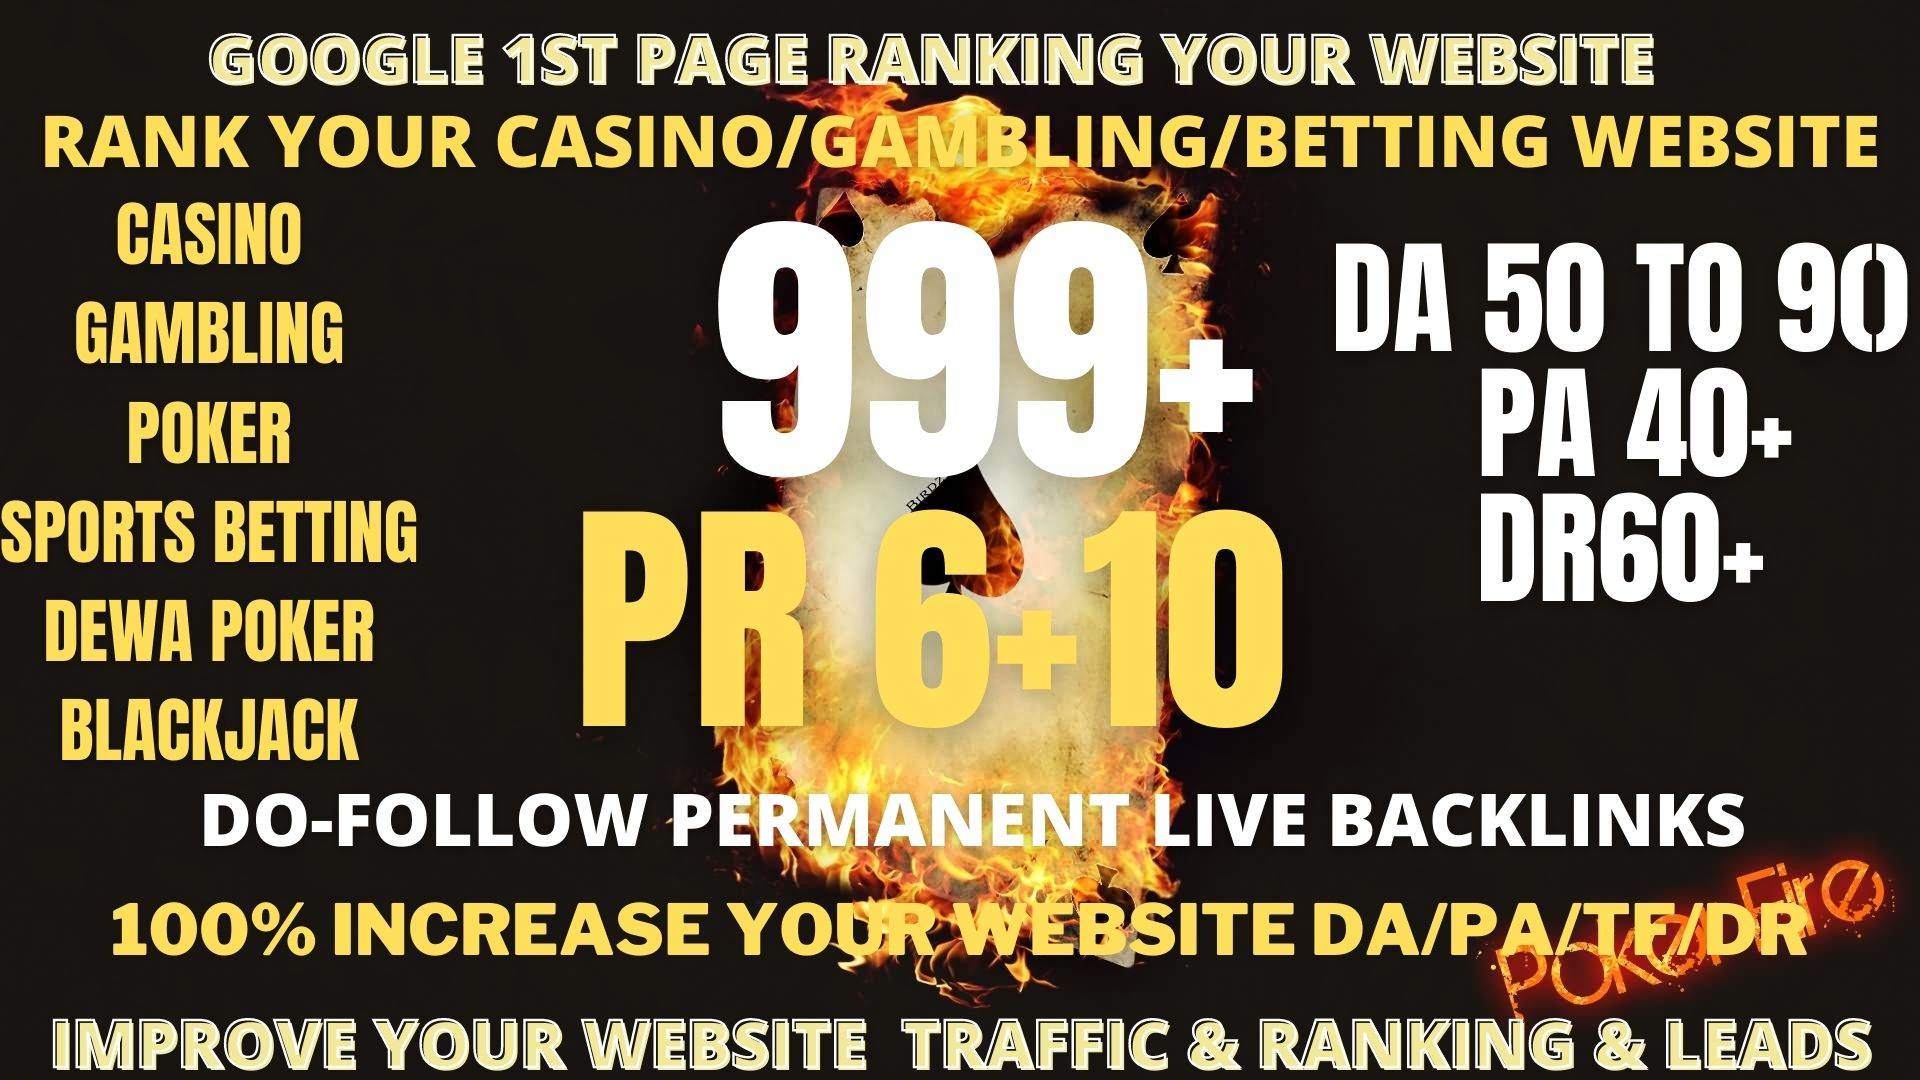 POWERFULL PBN 999+ Casino,  Gambling,  Poker,  Sports related unique site